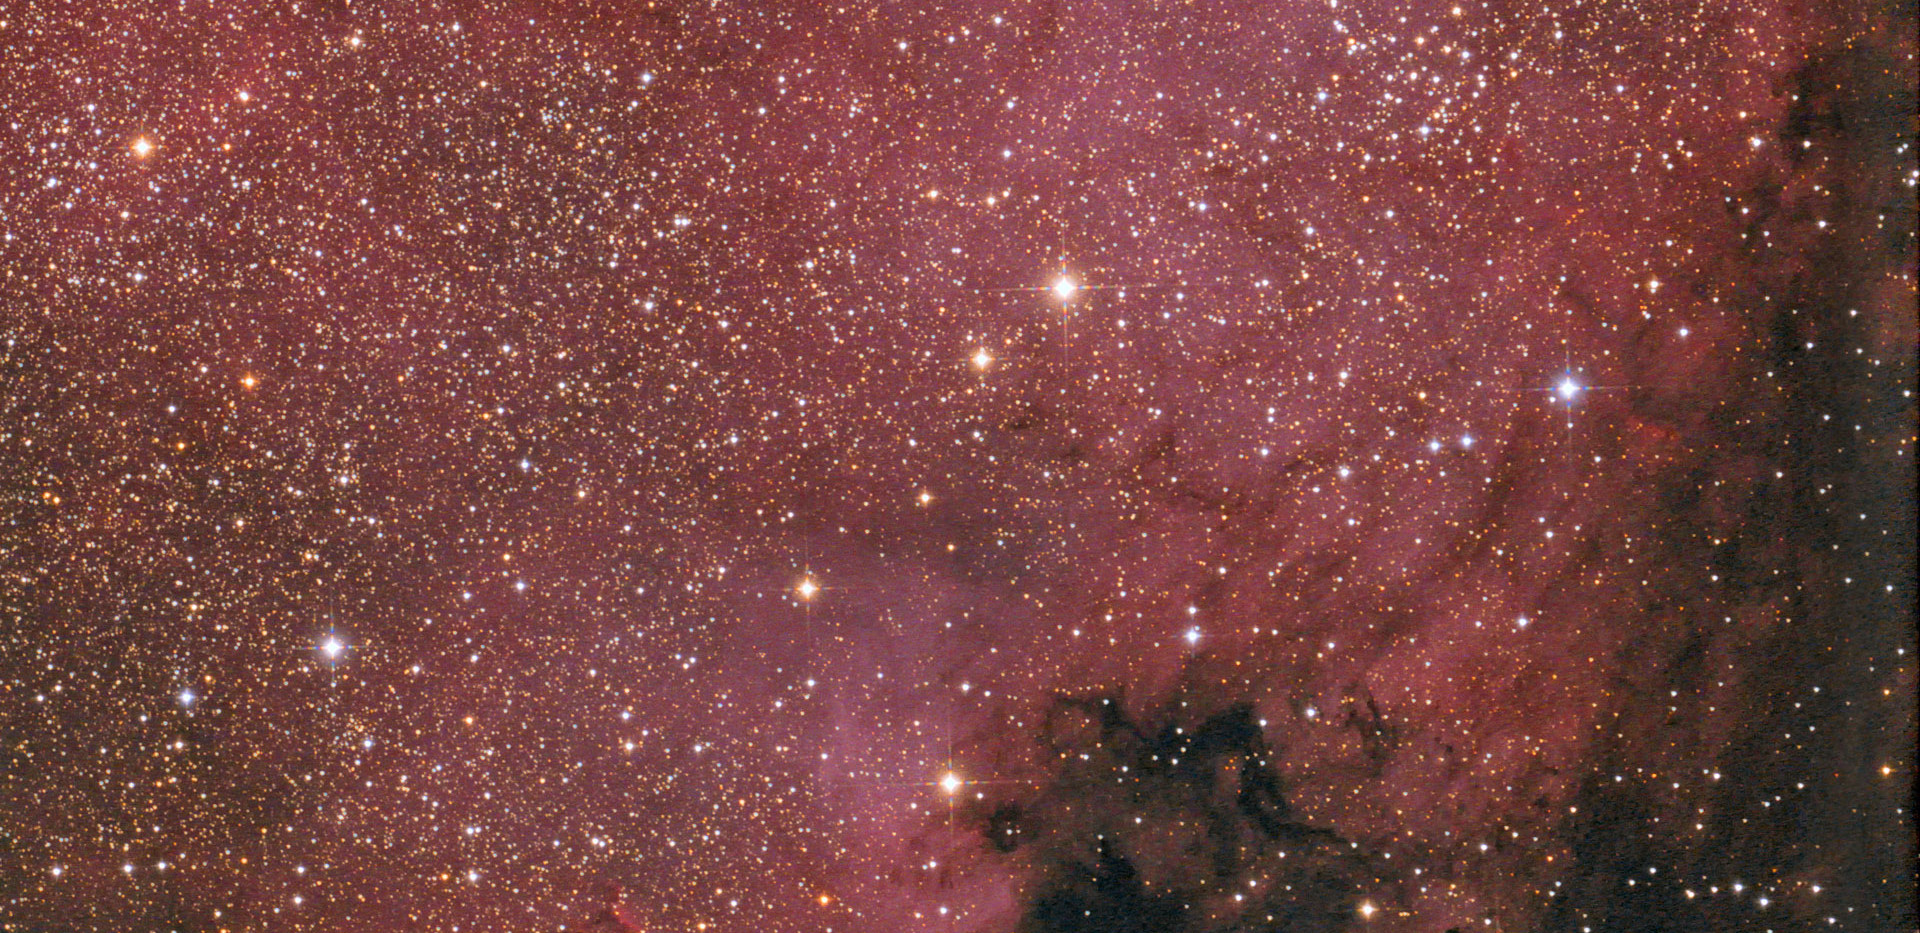 NGC7000_20200324_HSDO_FDK170S3N_CRUX140_